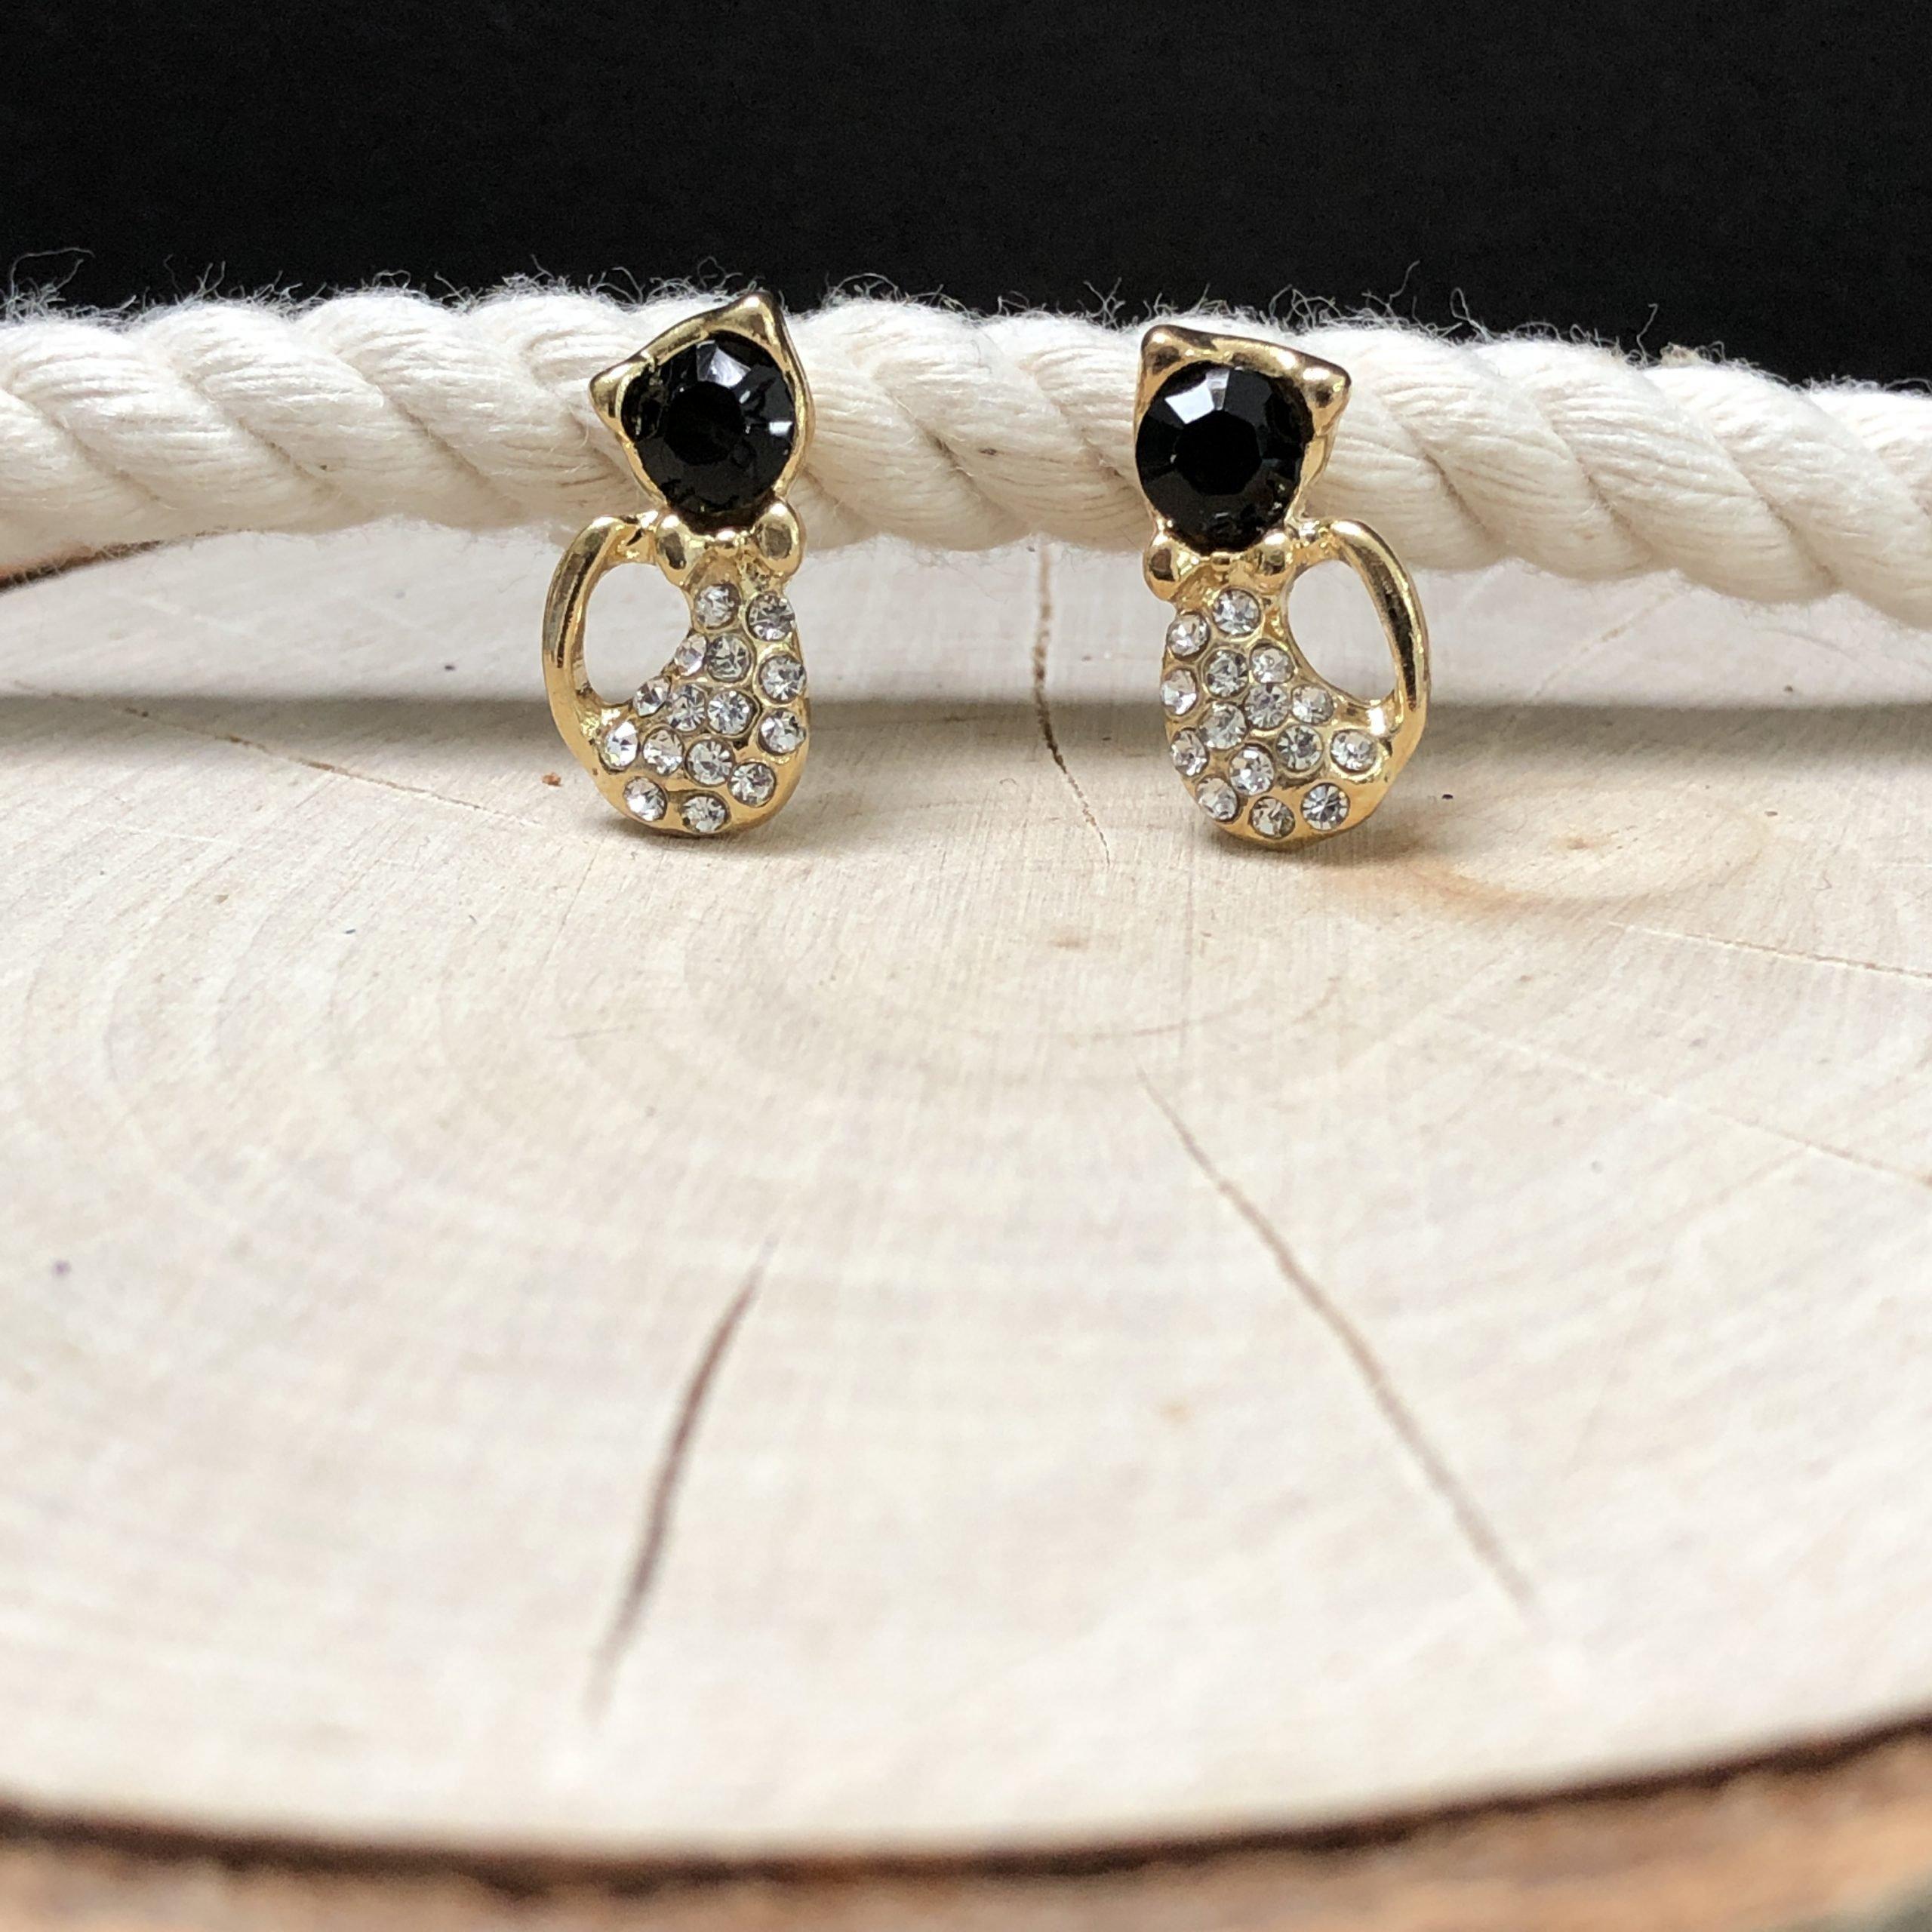 AristoCat earring